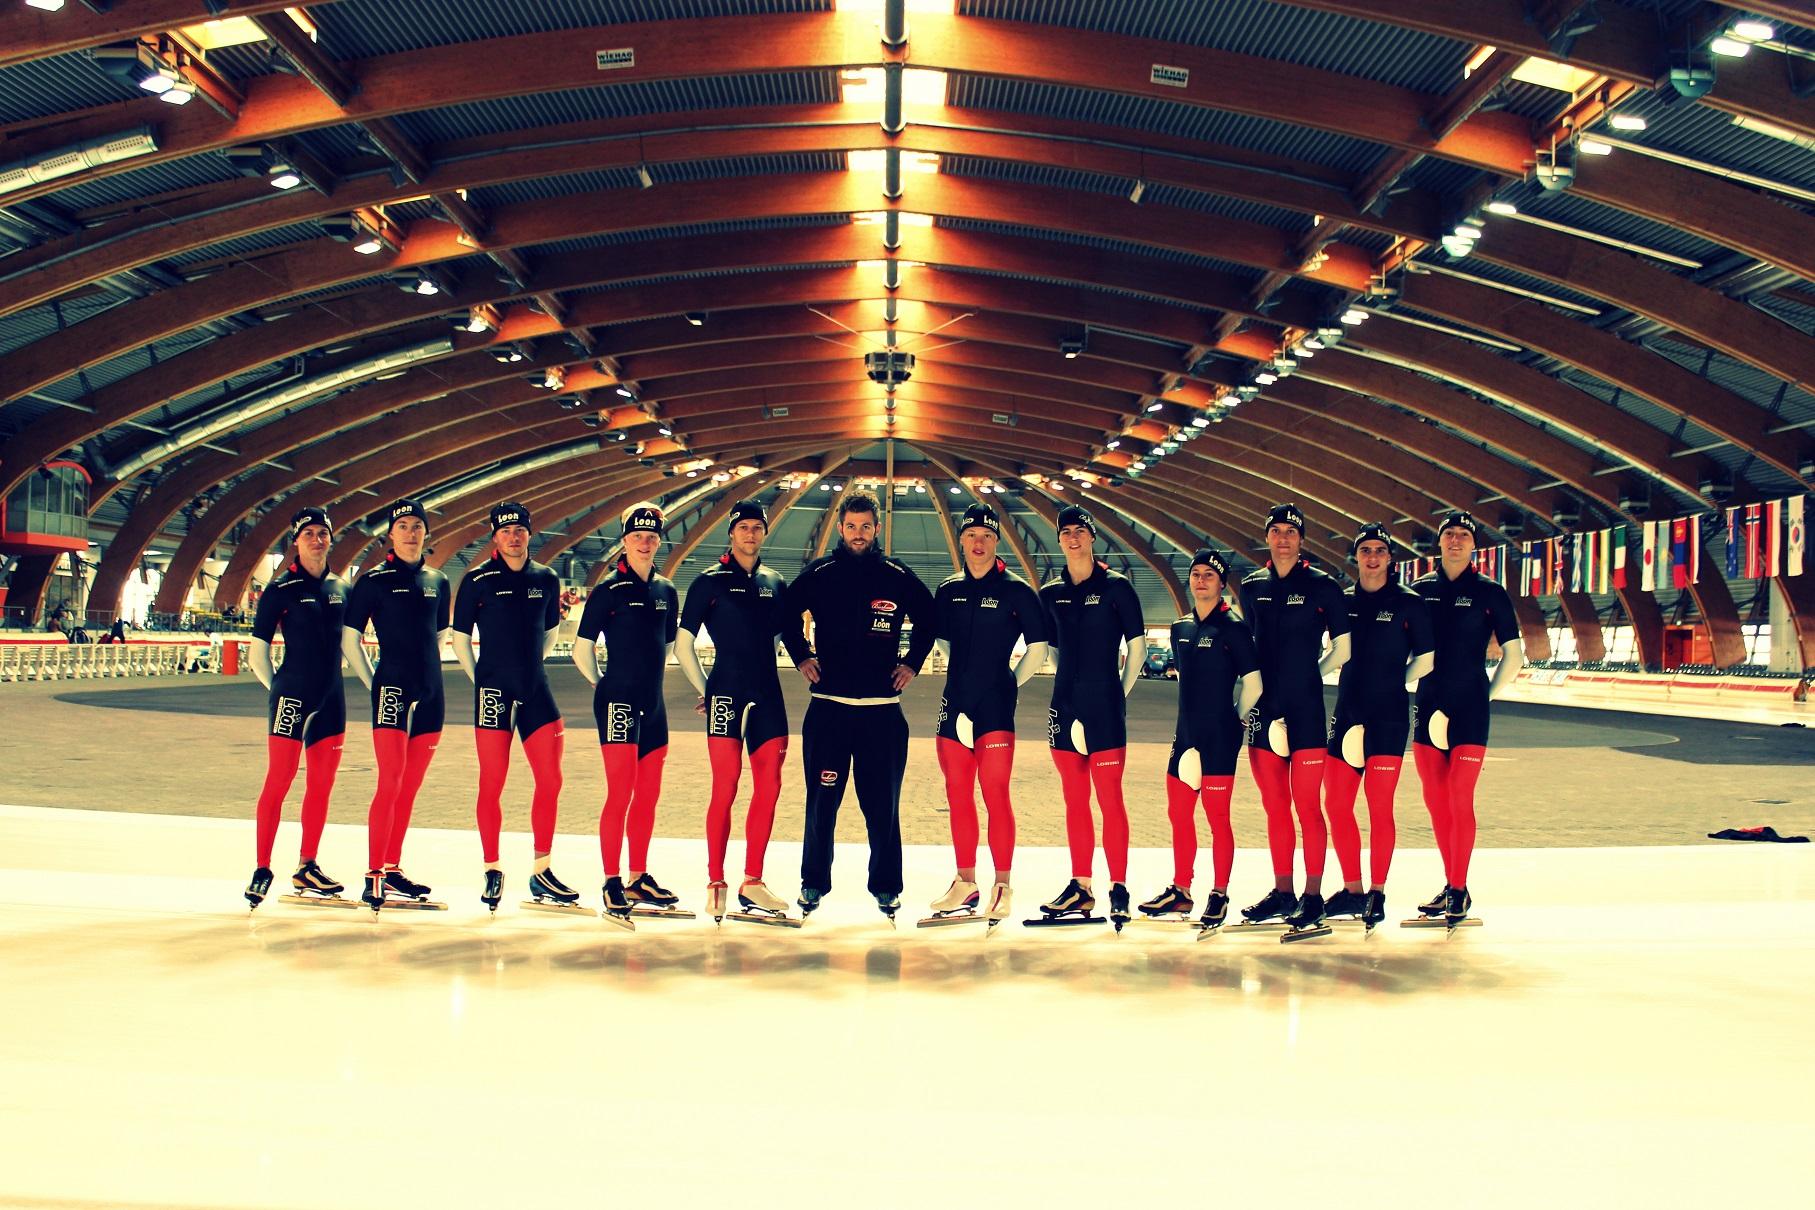 Teamfoto 2014-2015 (Erfurt)